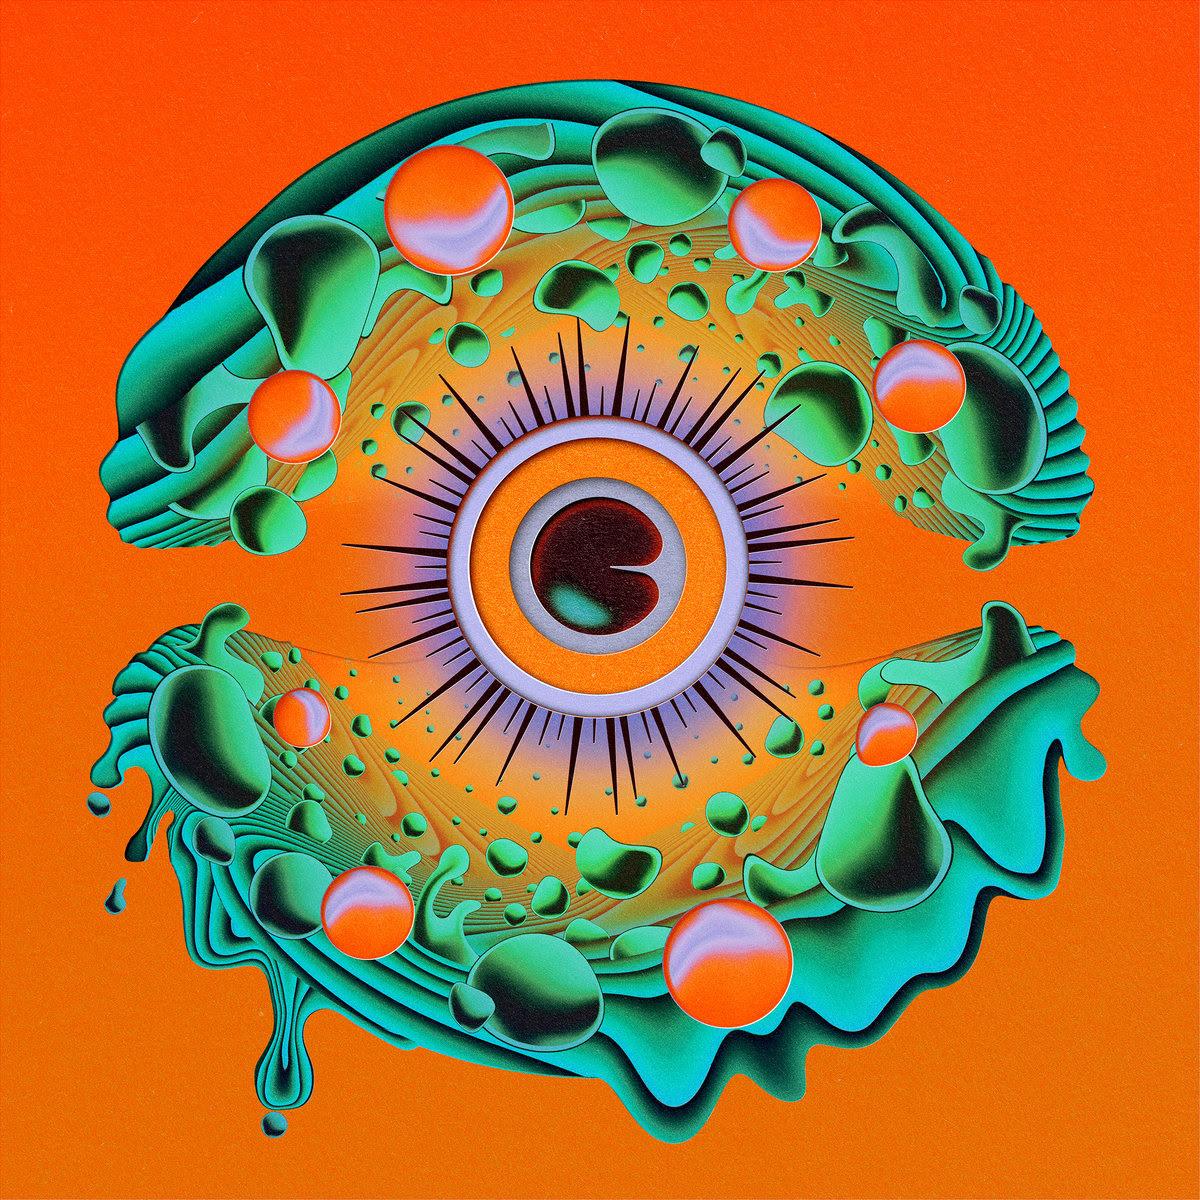 Abstraccion artwork